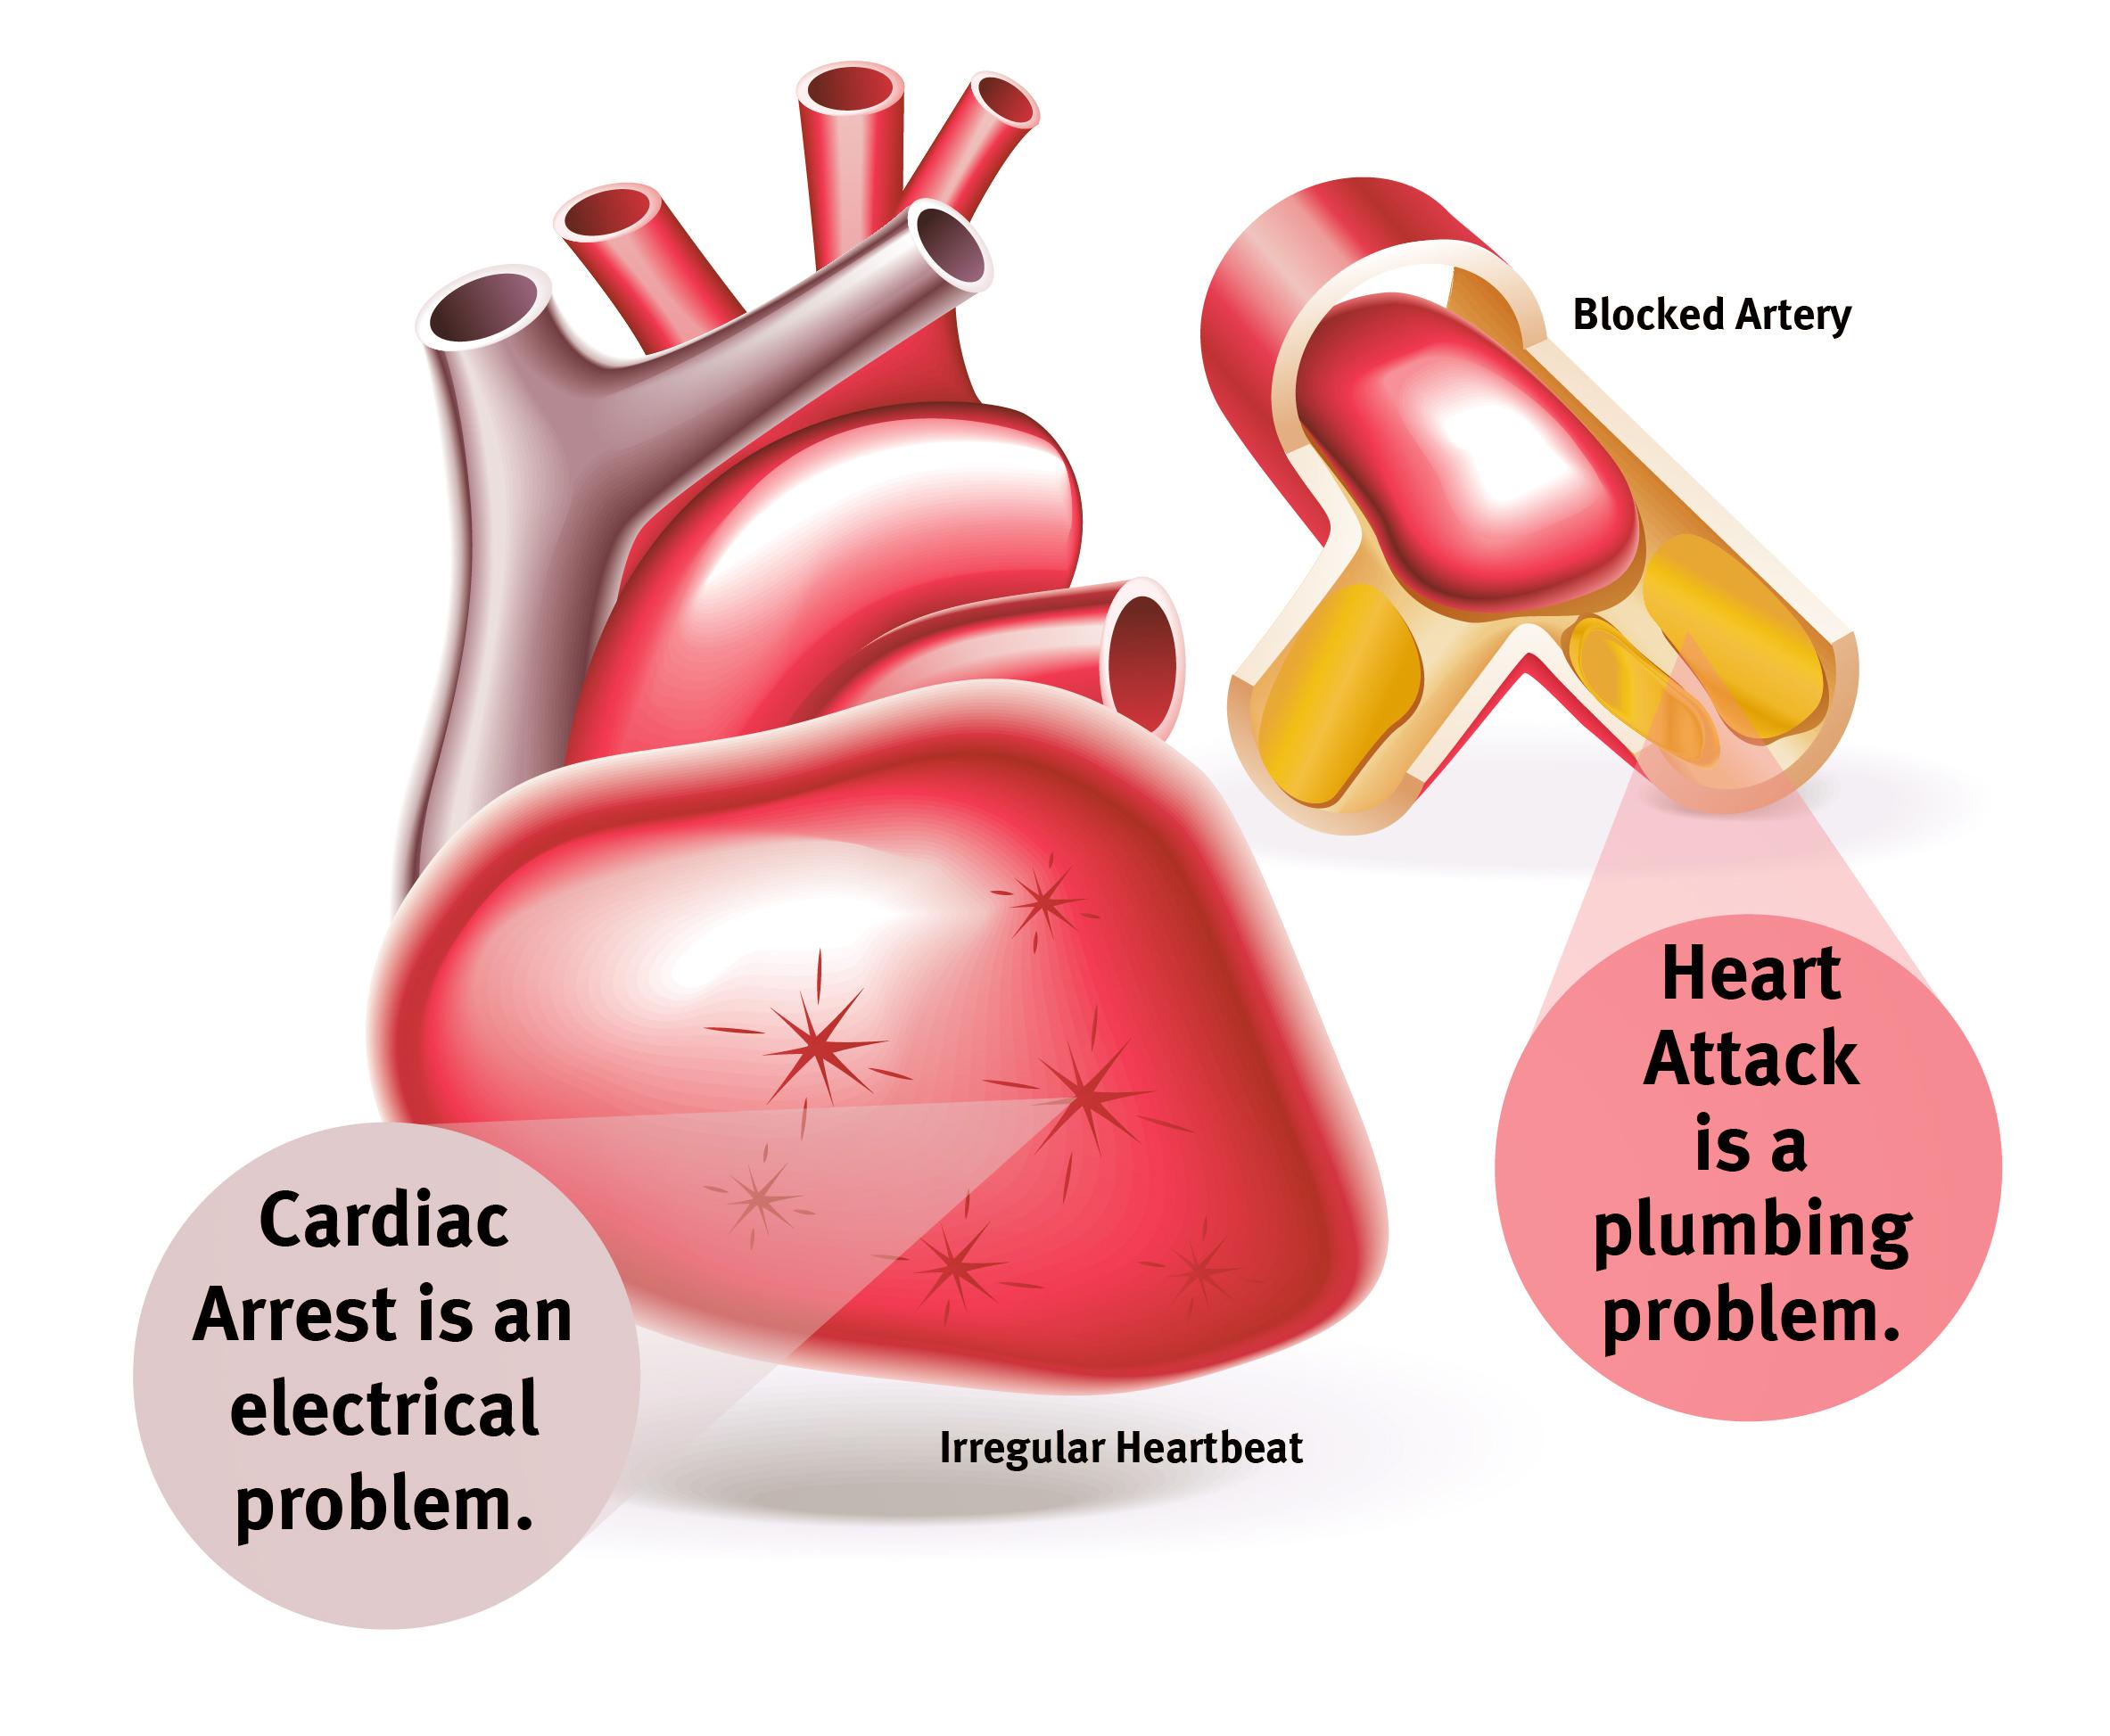 Heart Aattack VS Cardiac Arrest